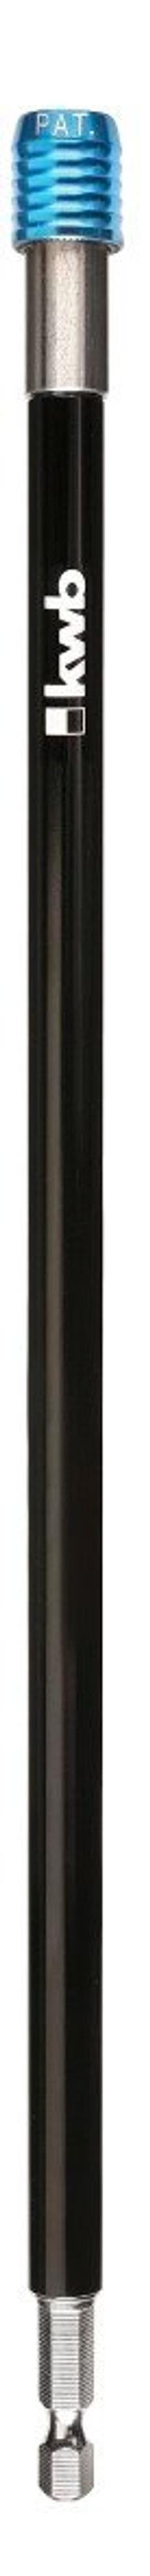 QUICK CHANGE Schnellwechsel-Bithalter, extra lang, 300 mm